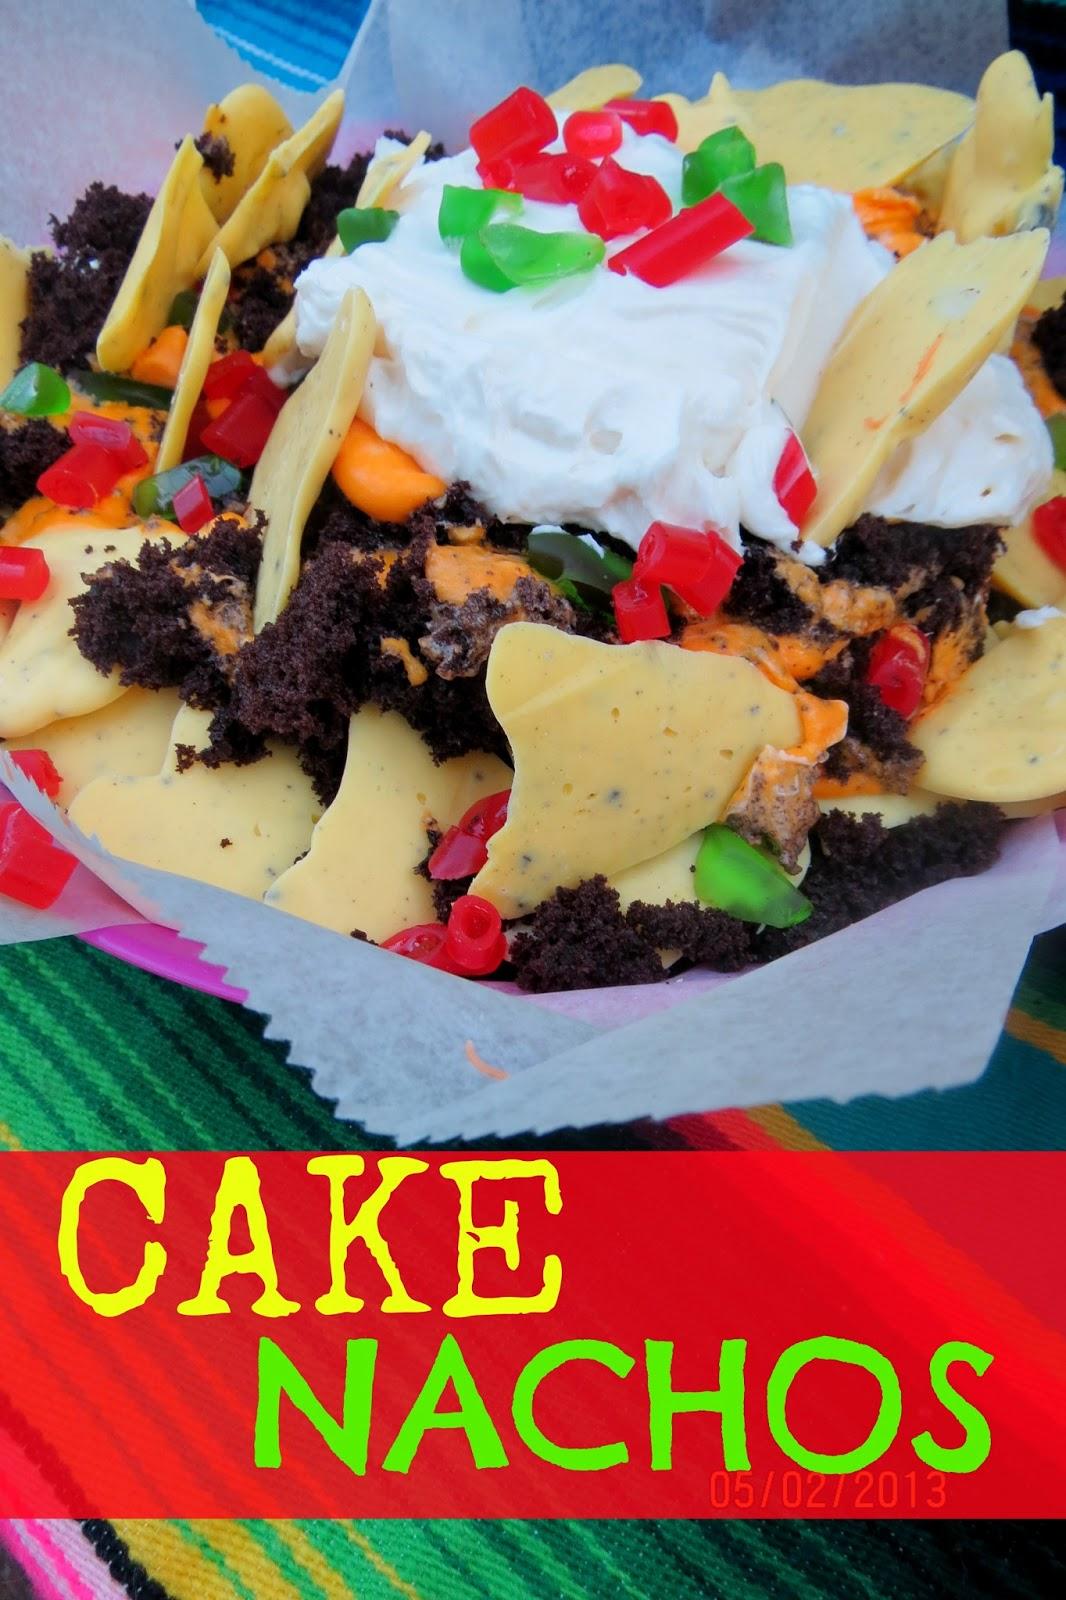 Chica Chocolatina The Ultimate Cake Nachos